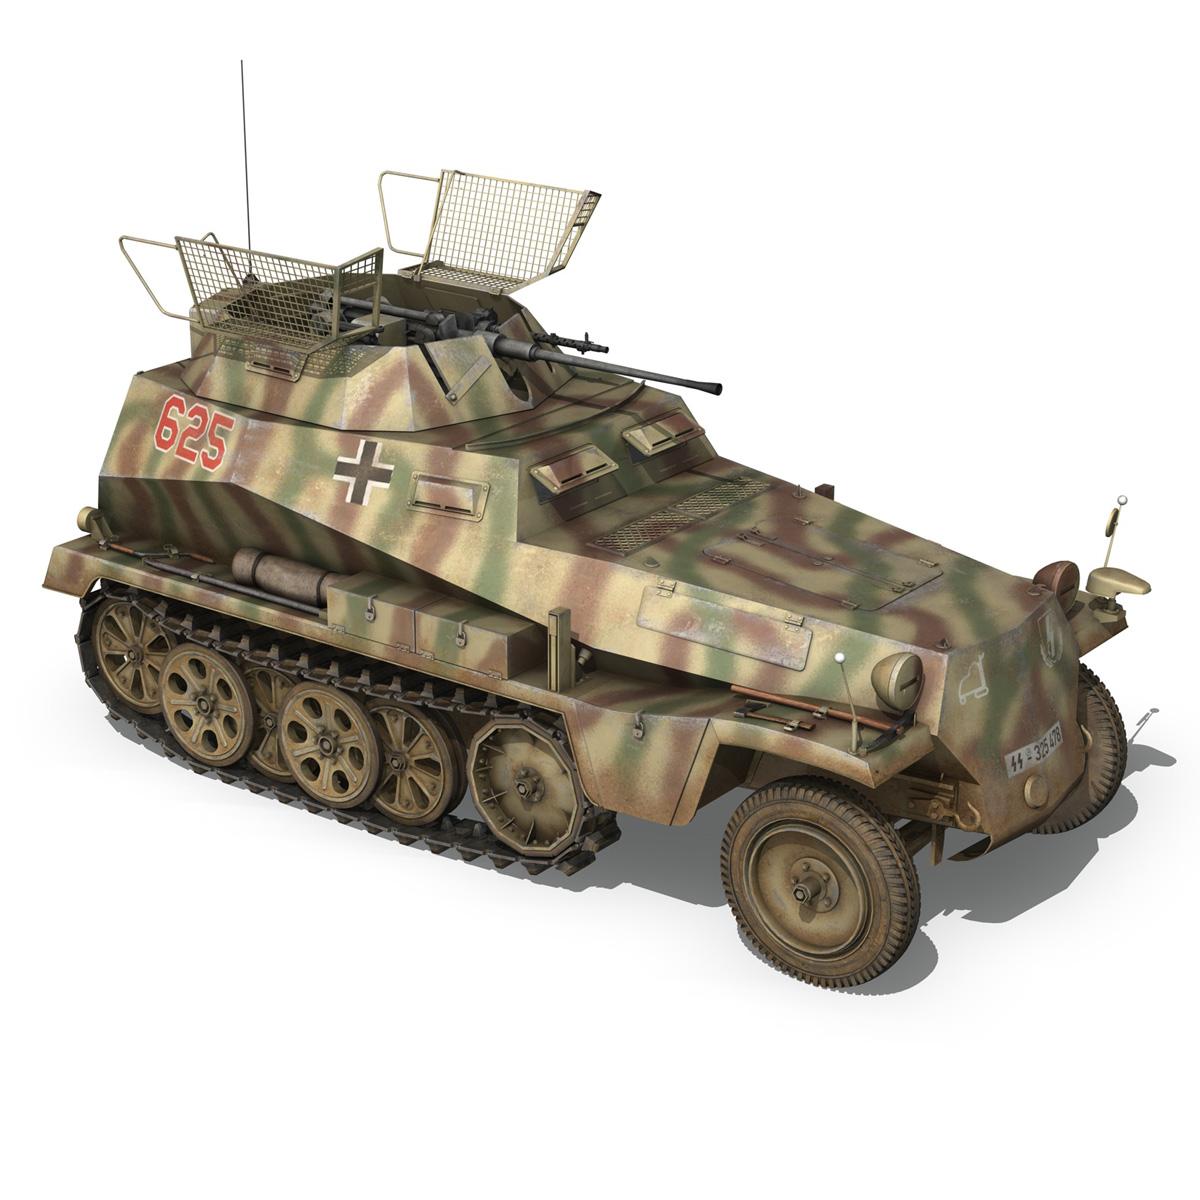 sd.kfz 250 9 – half-track armored vehicle 3d model 3ds fbx c4d lwo obj 198217